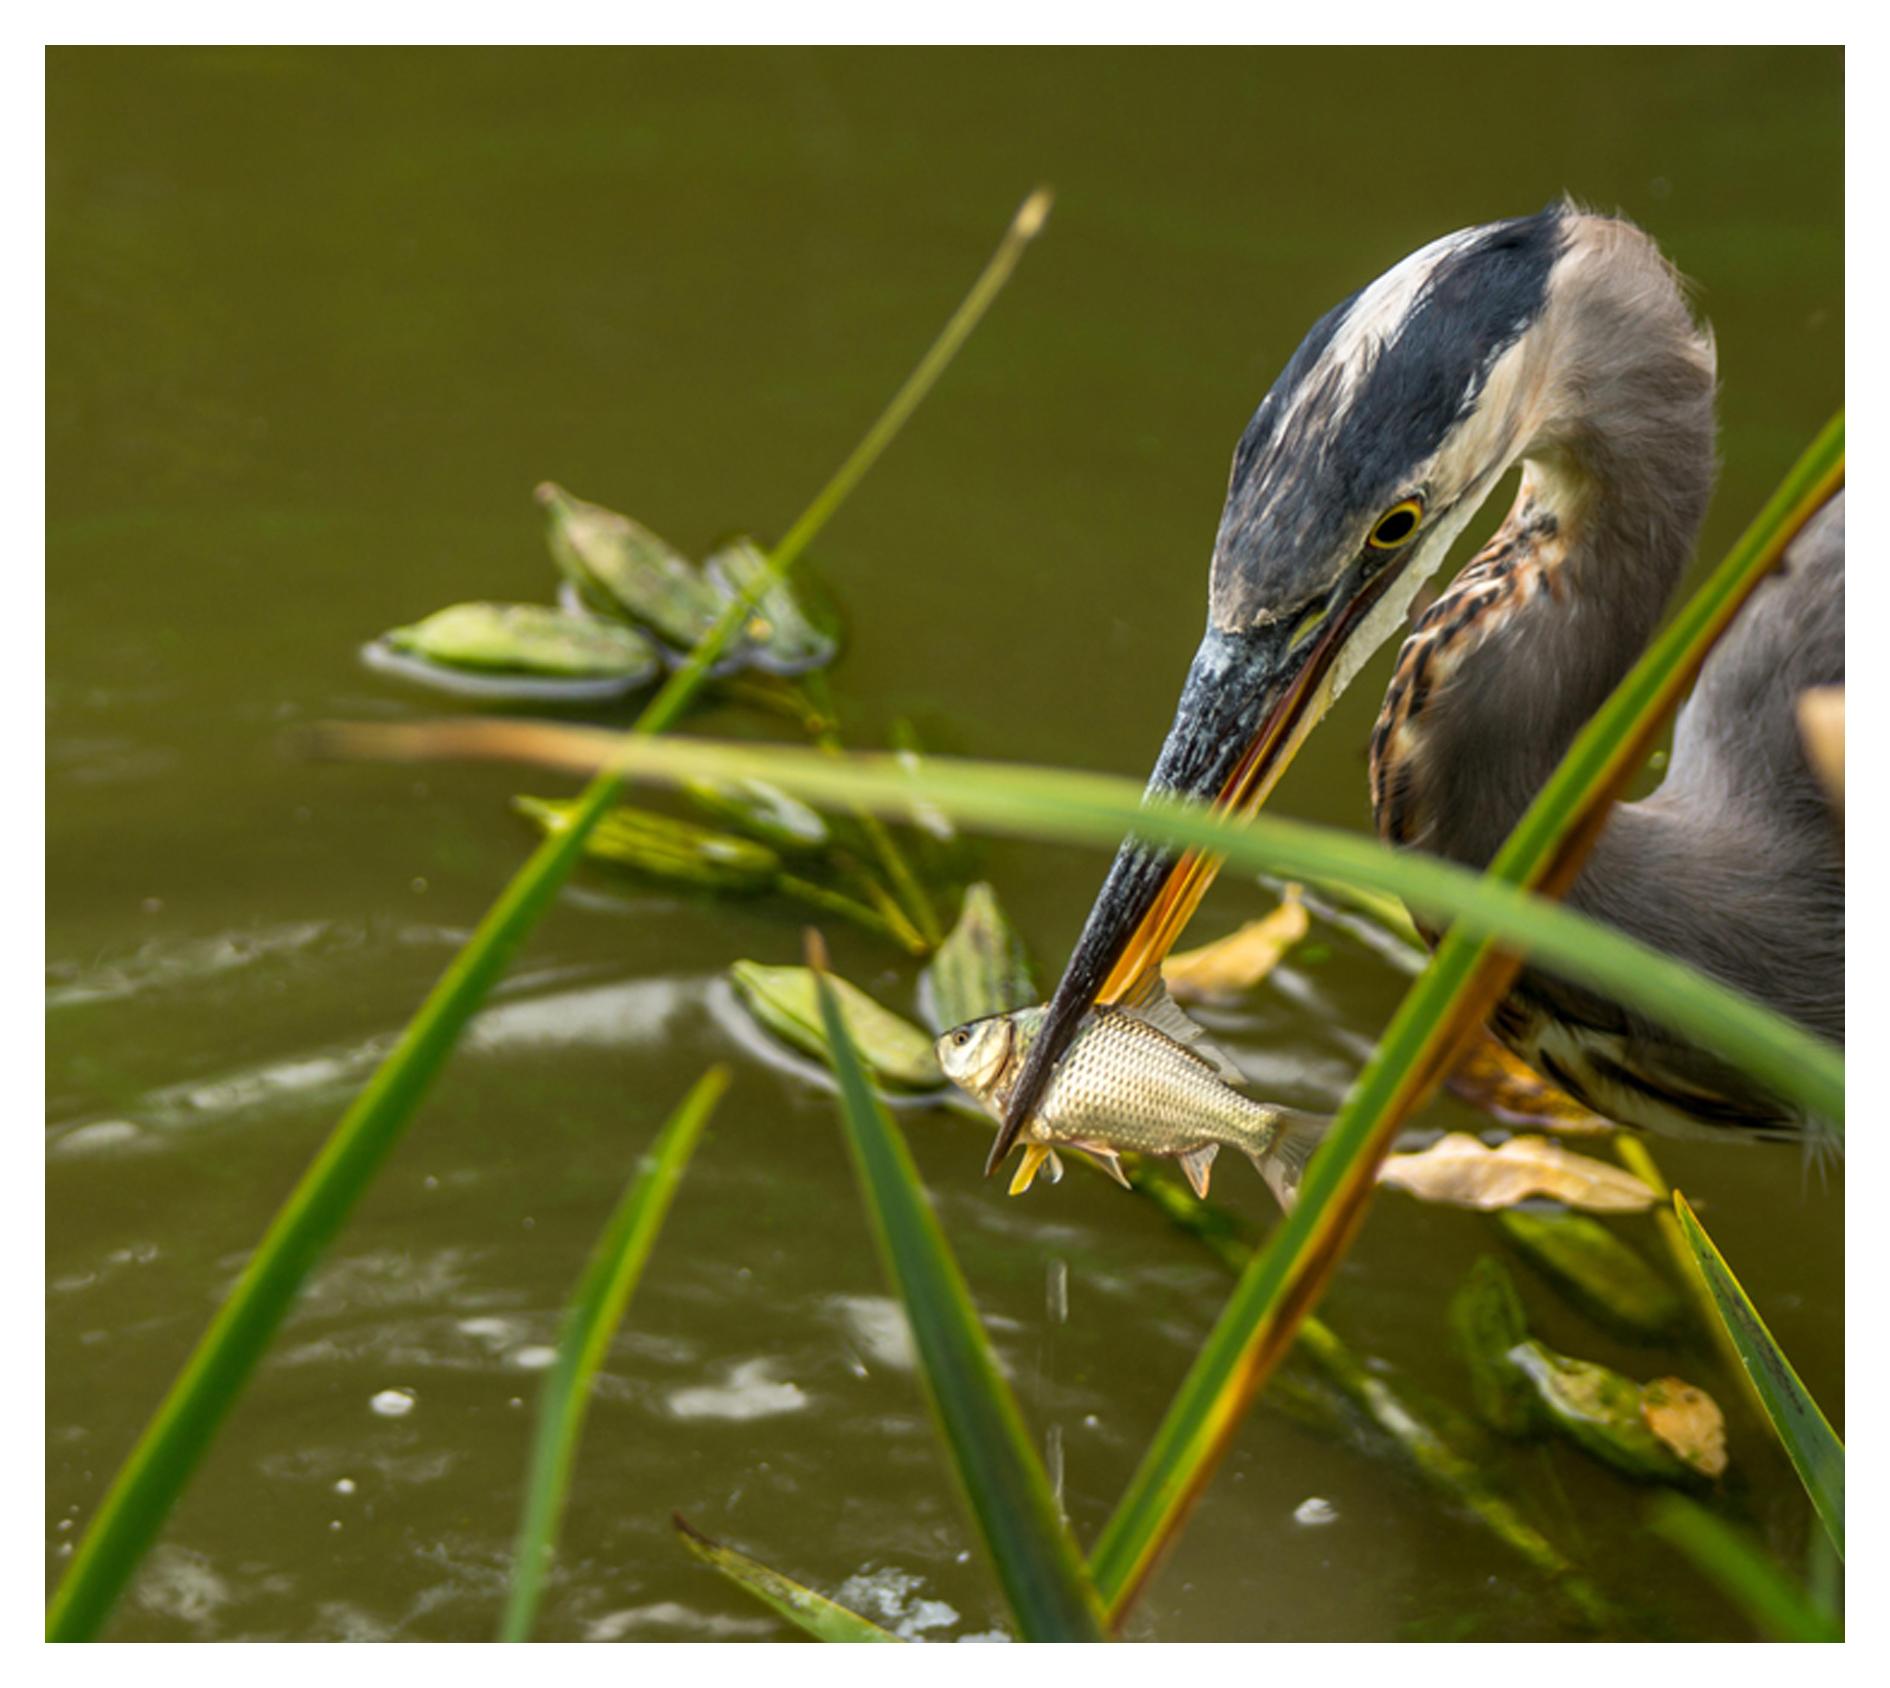 2014-09-01 Vancouver Stanley Park Lost Lagoon Heron 01-1